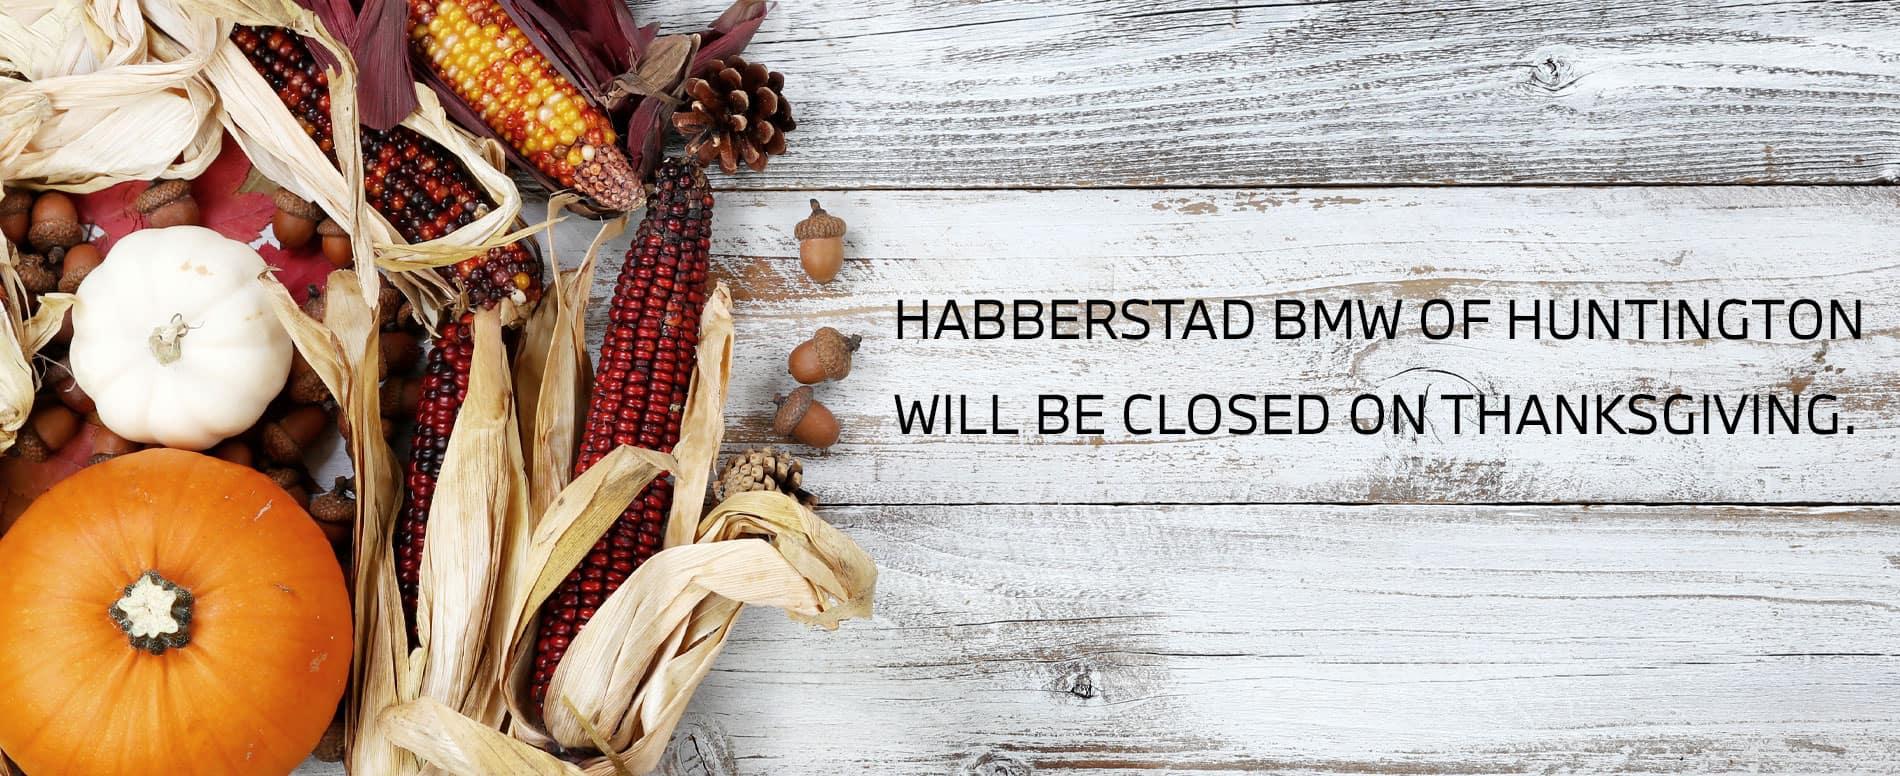 Huntington-Thanksgiving2020